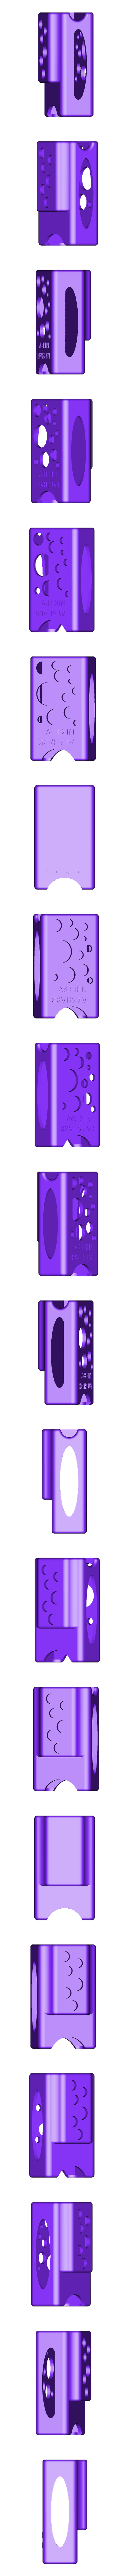 Tattu_LiPo_2S_holder_for_FPV_goggles_v1_v5.stl Télécharger fichier STL gratuit Tattu LiPo 2500mAh 2S 7.4V manchon, étui, support, lunettes Fatshark Skyzone • Design pour imprimante 3D, nik101968